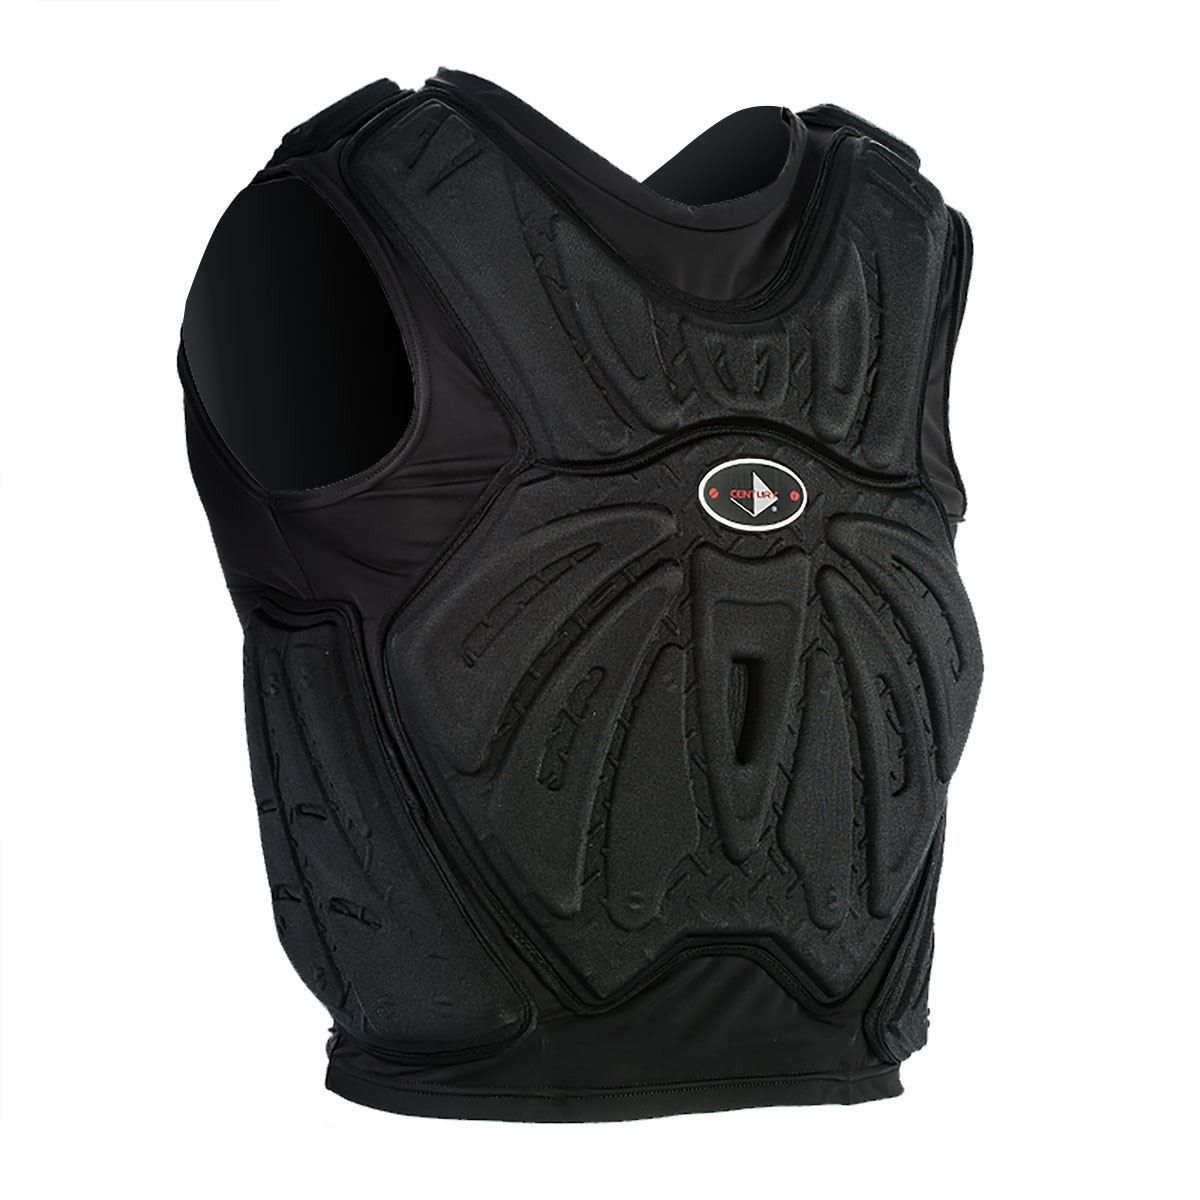 Martial Armor Vest c14936